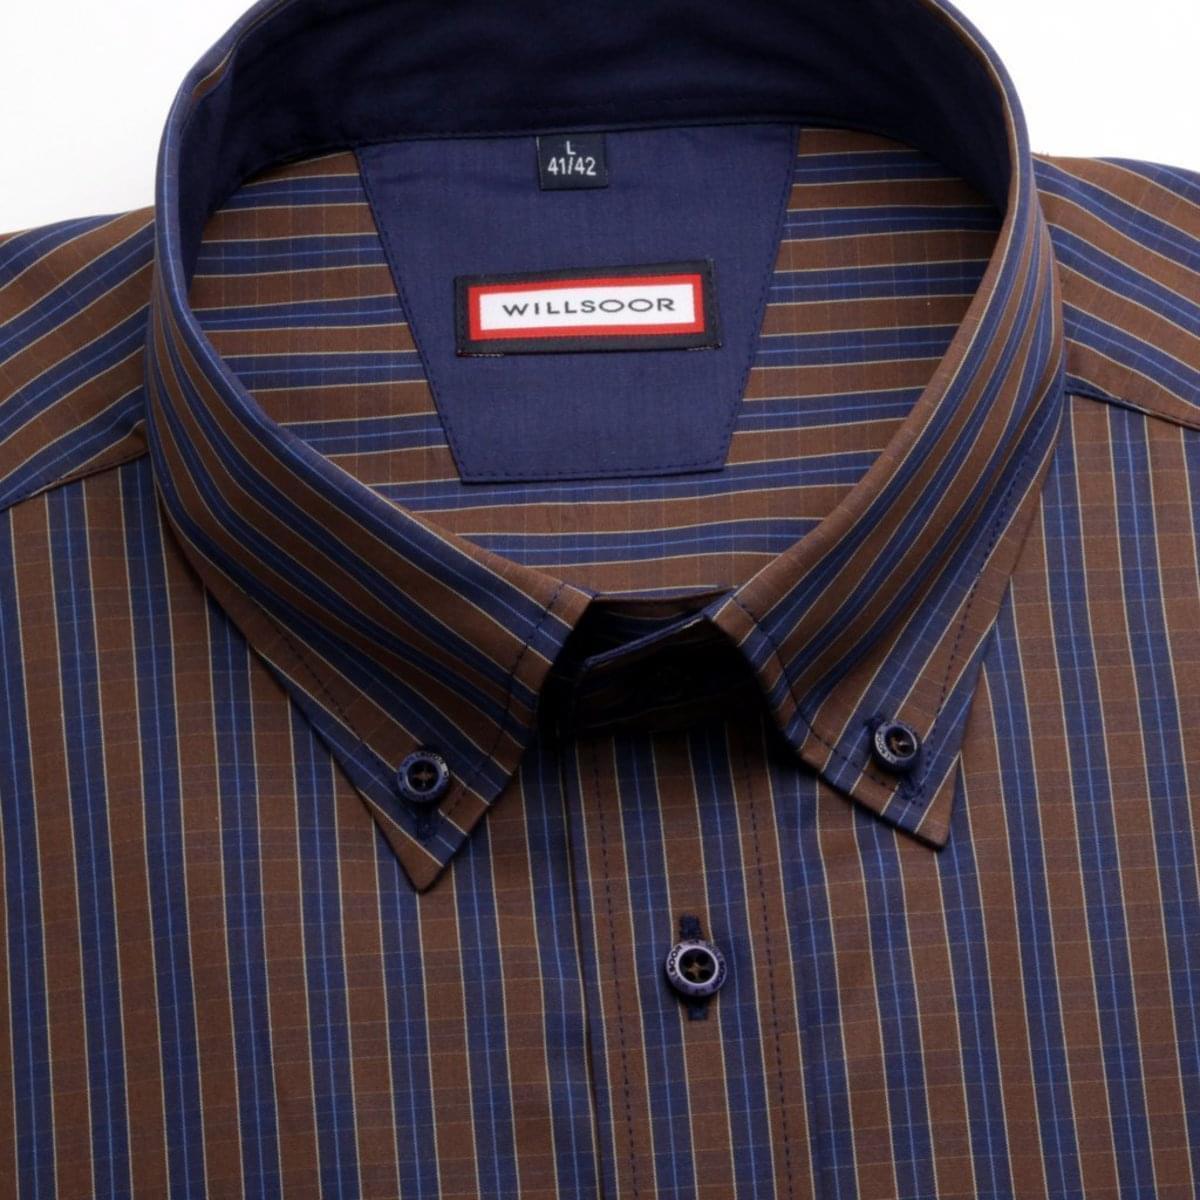 Willsoor Pánska košeľa WR Classic (výška 188-194) 1925 188-194 / L (41/42)